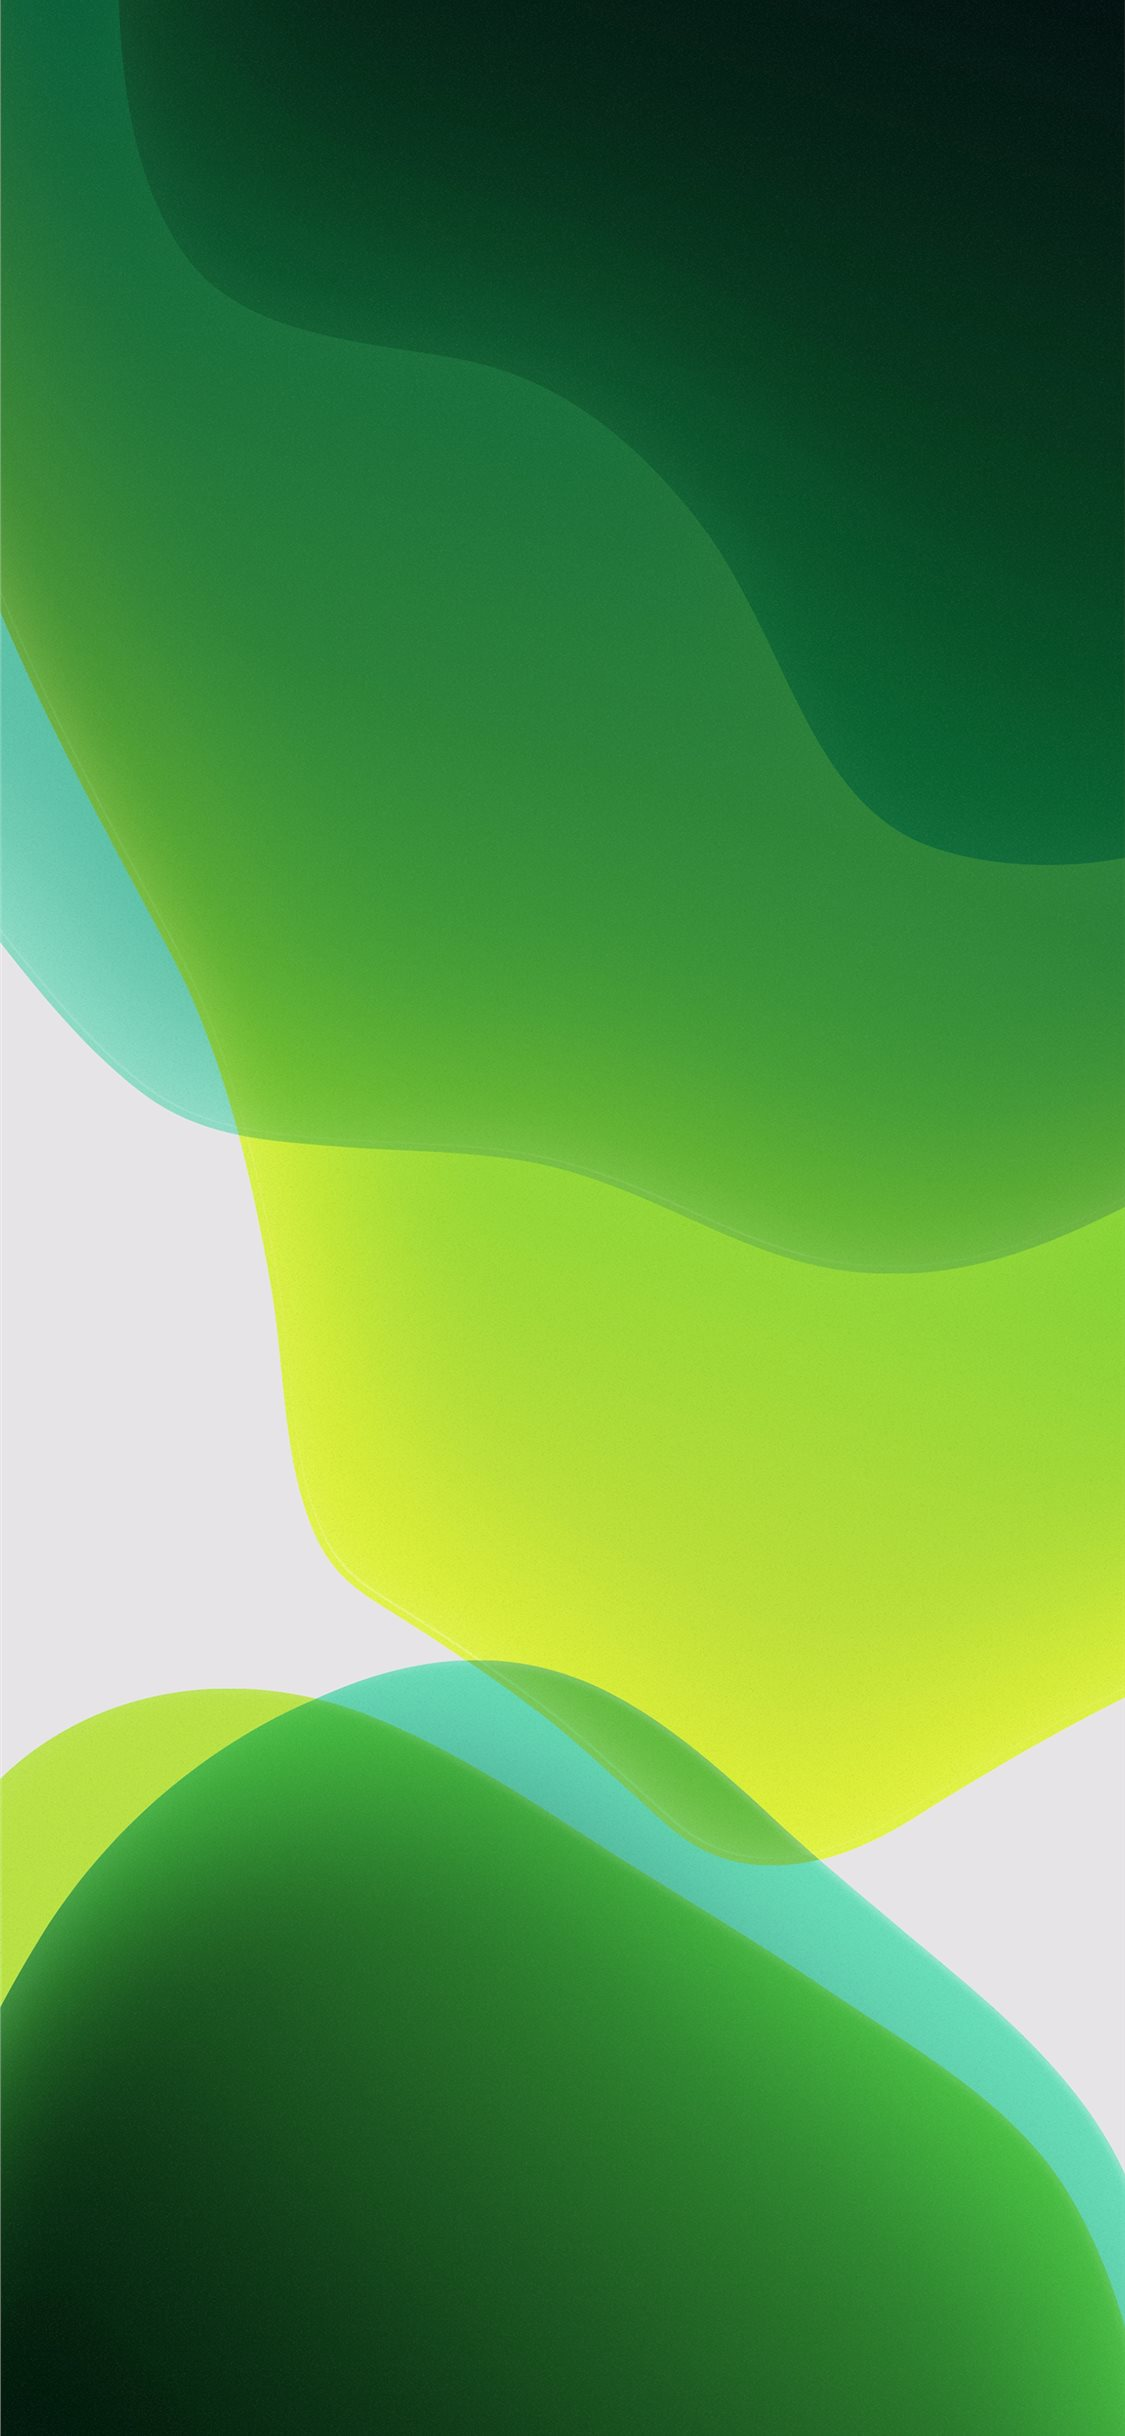 Iphone 4 Ios 10 Telecharger Ios 13 Wallpaper 4k 1125x2436 Wallpaper Teahub Io